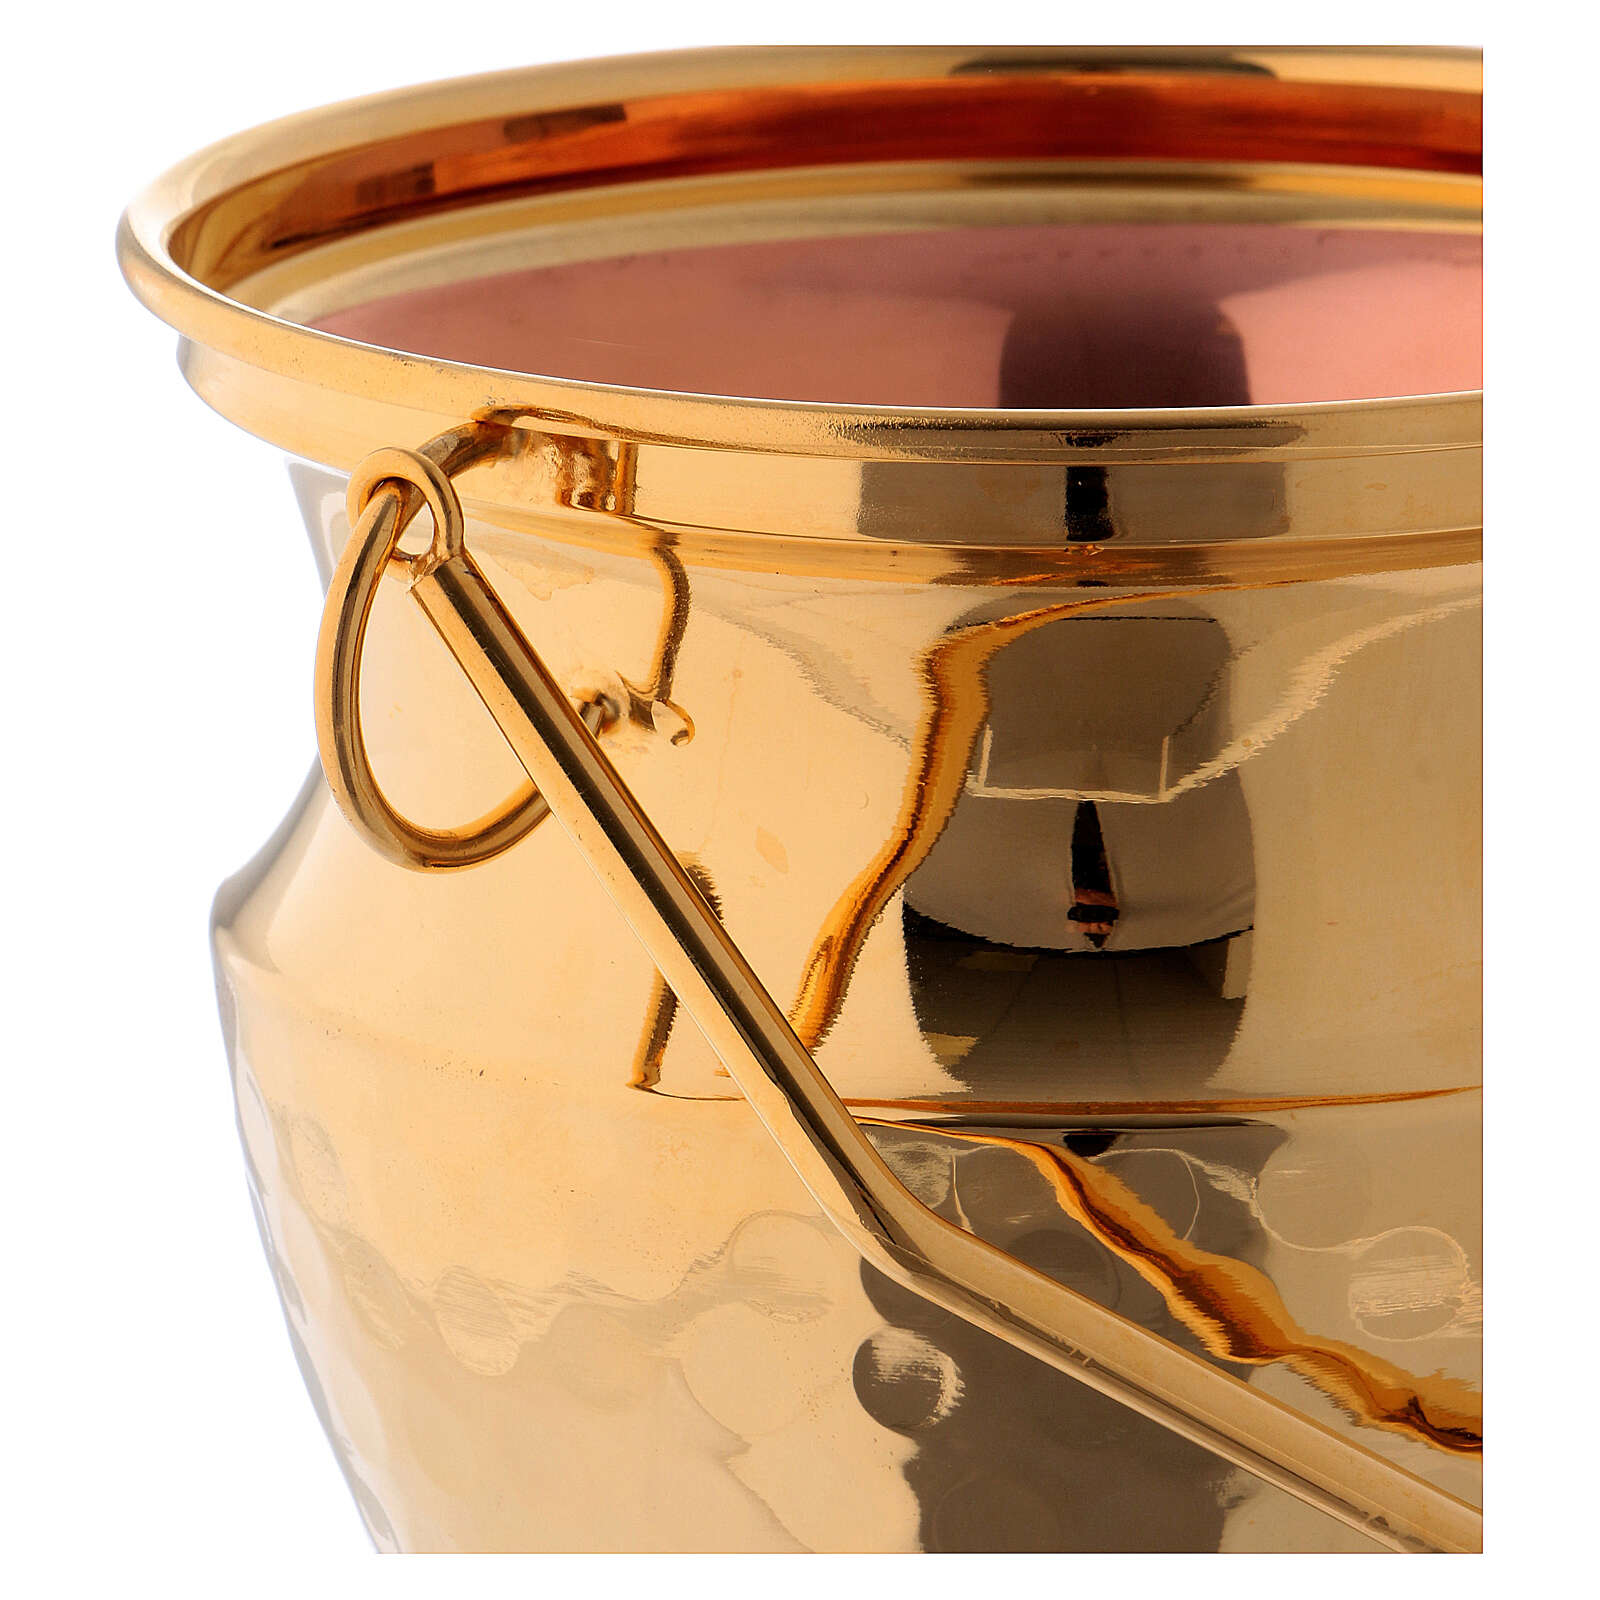 Aspersorium for holy water in golden brass 3